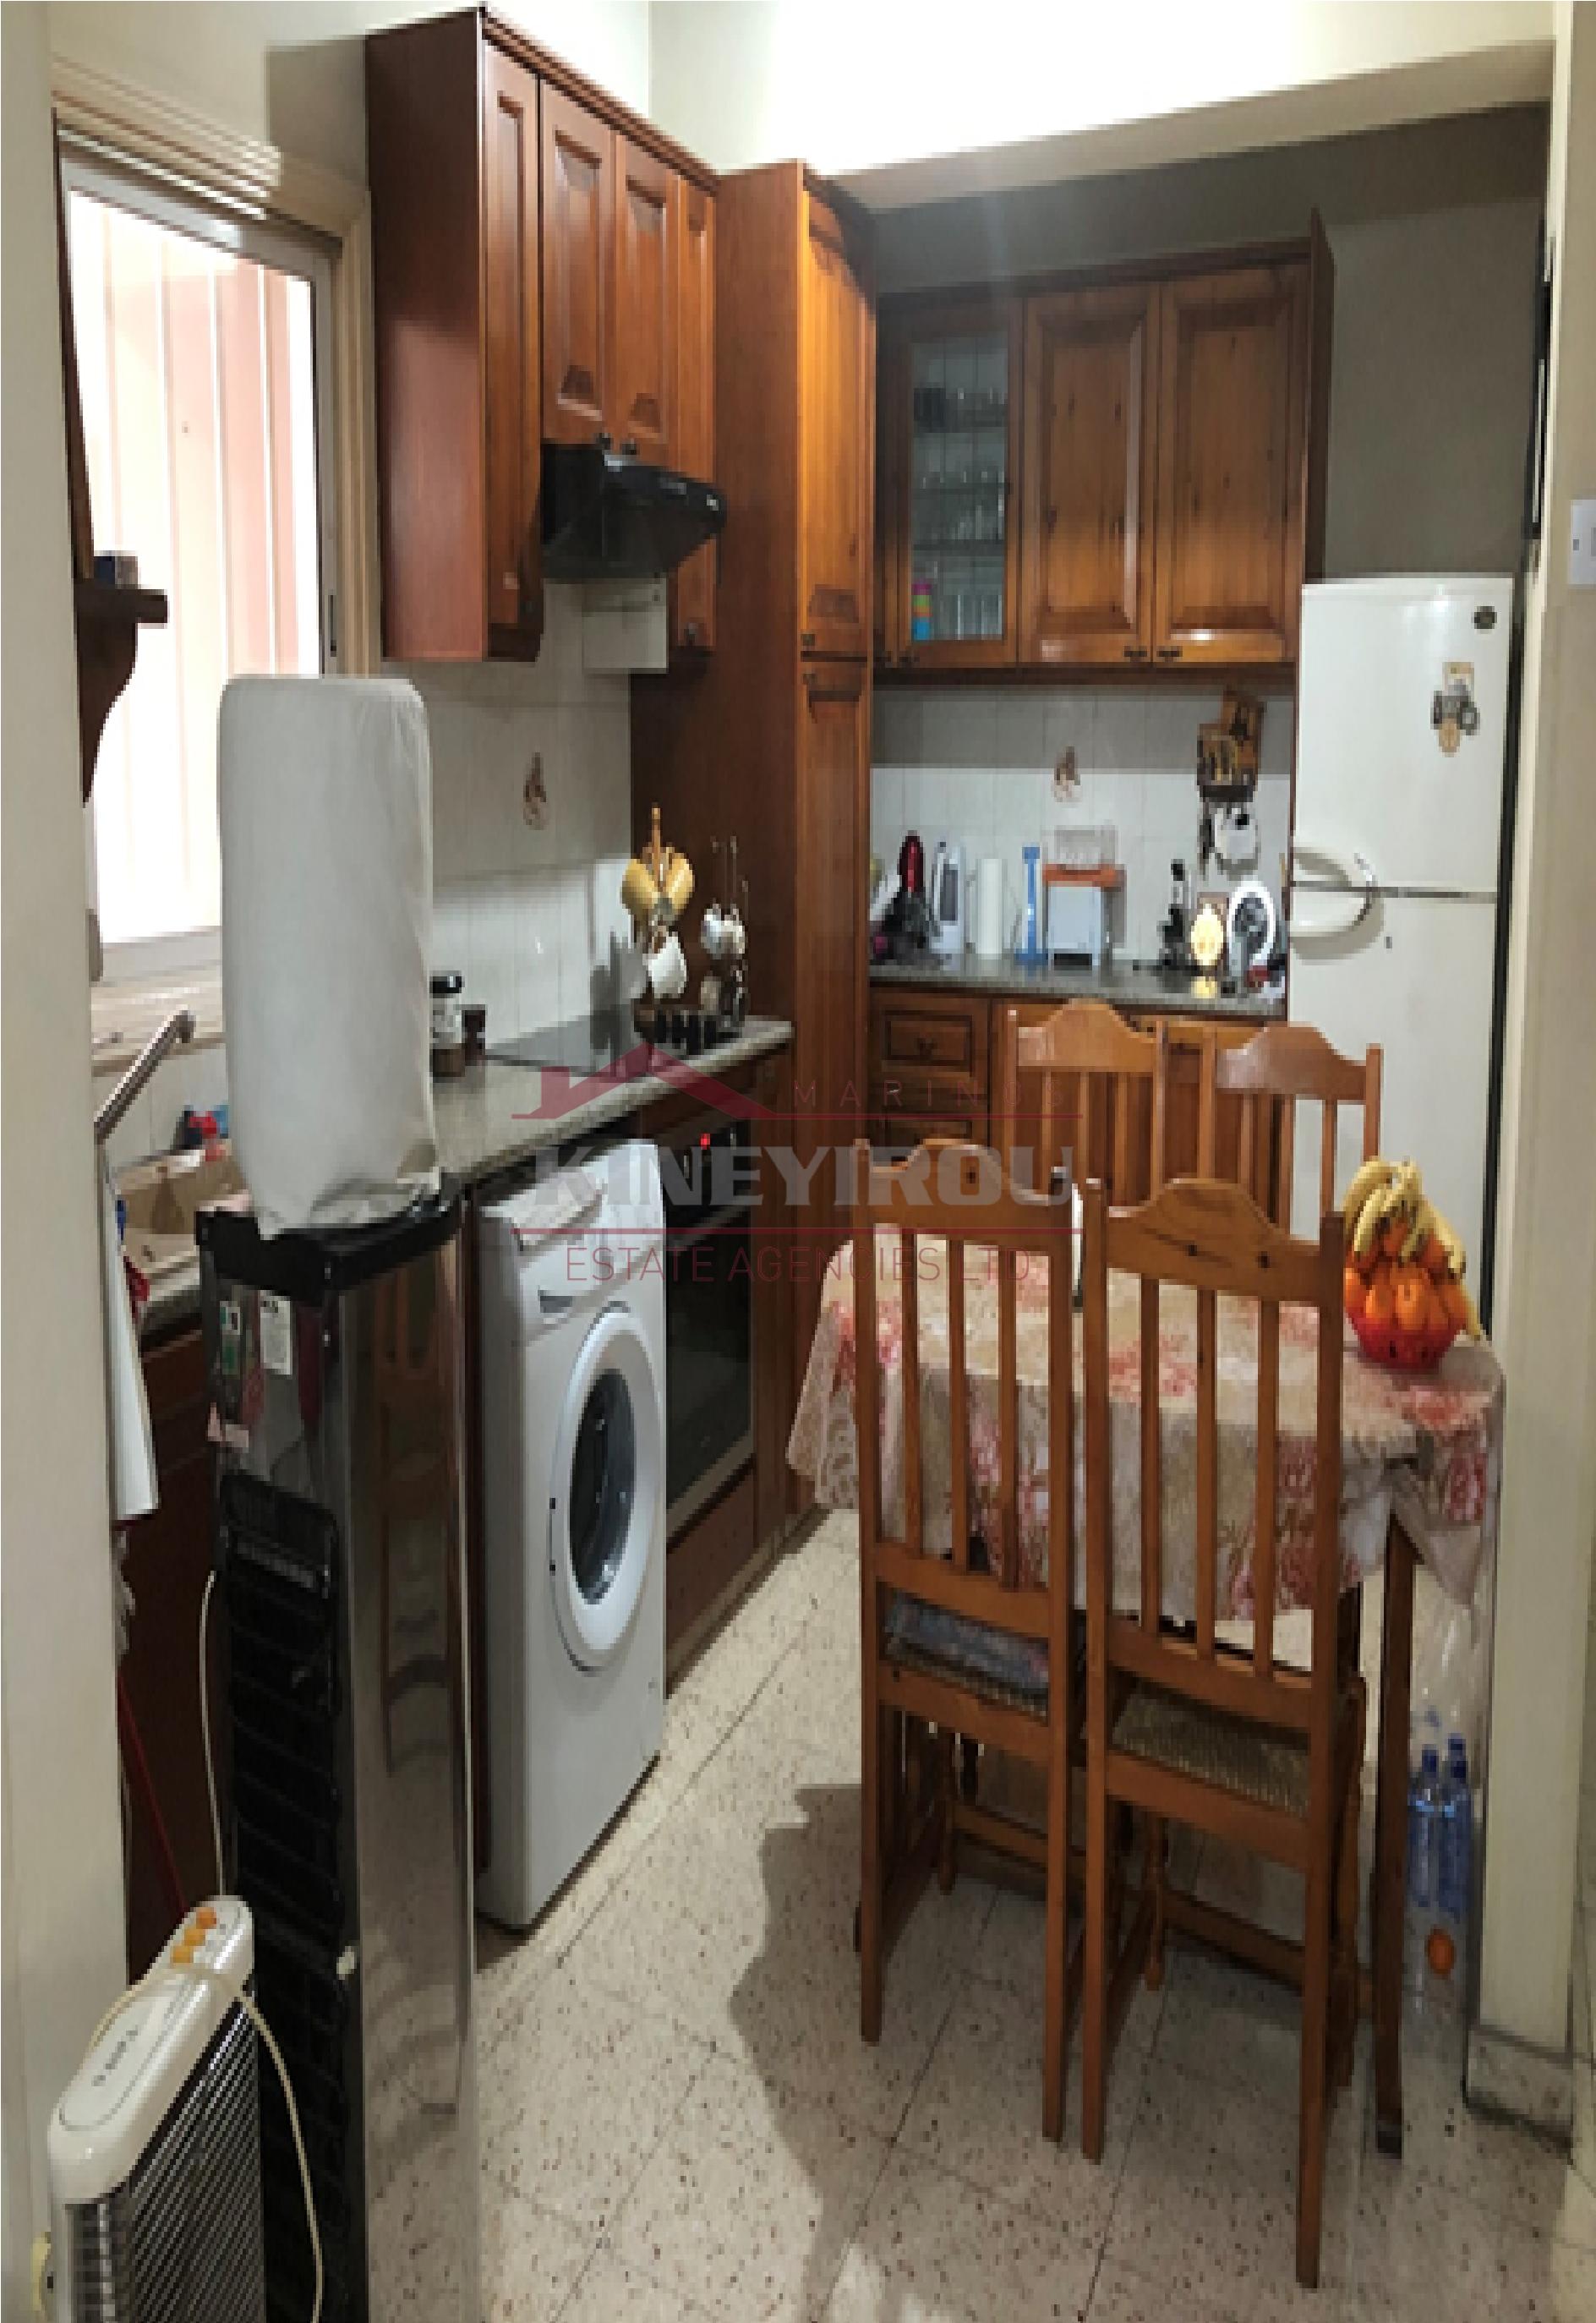 Apartment For Sale in Drosia-Larnaca